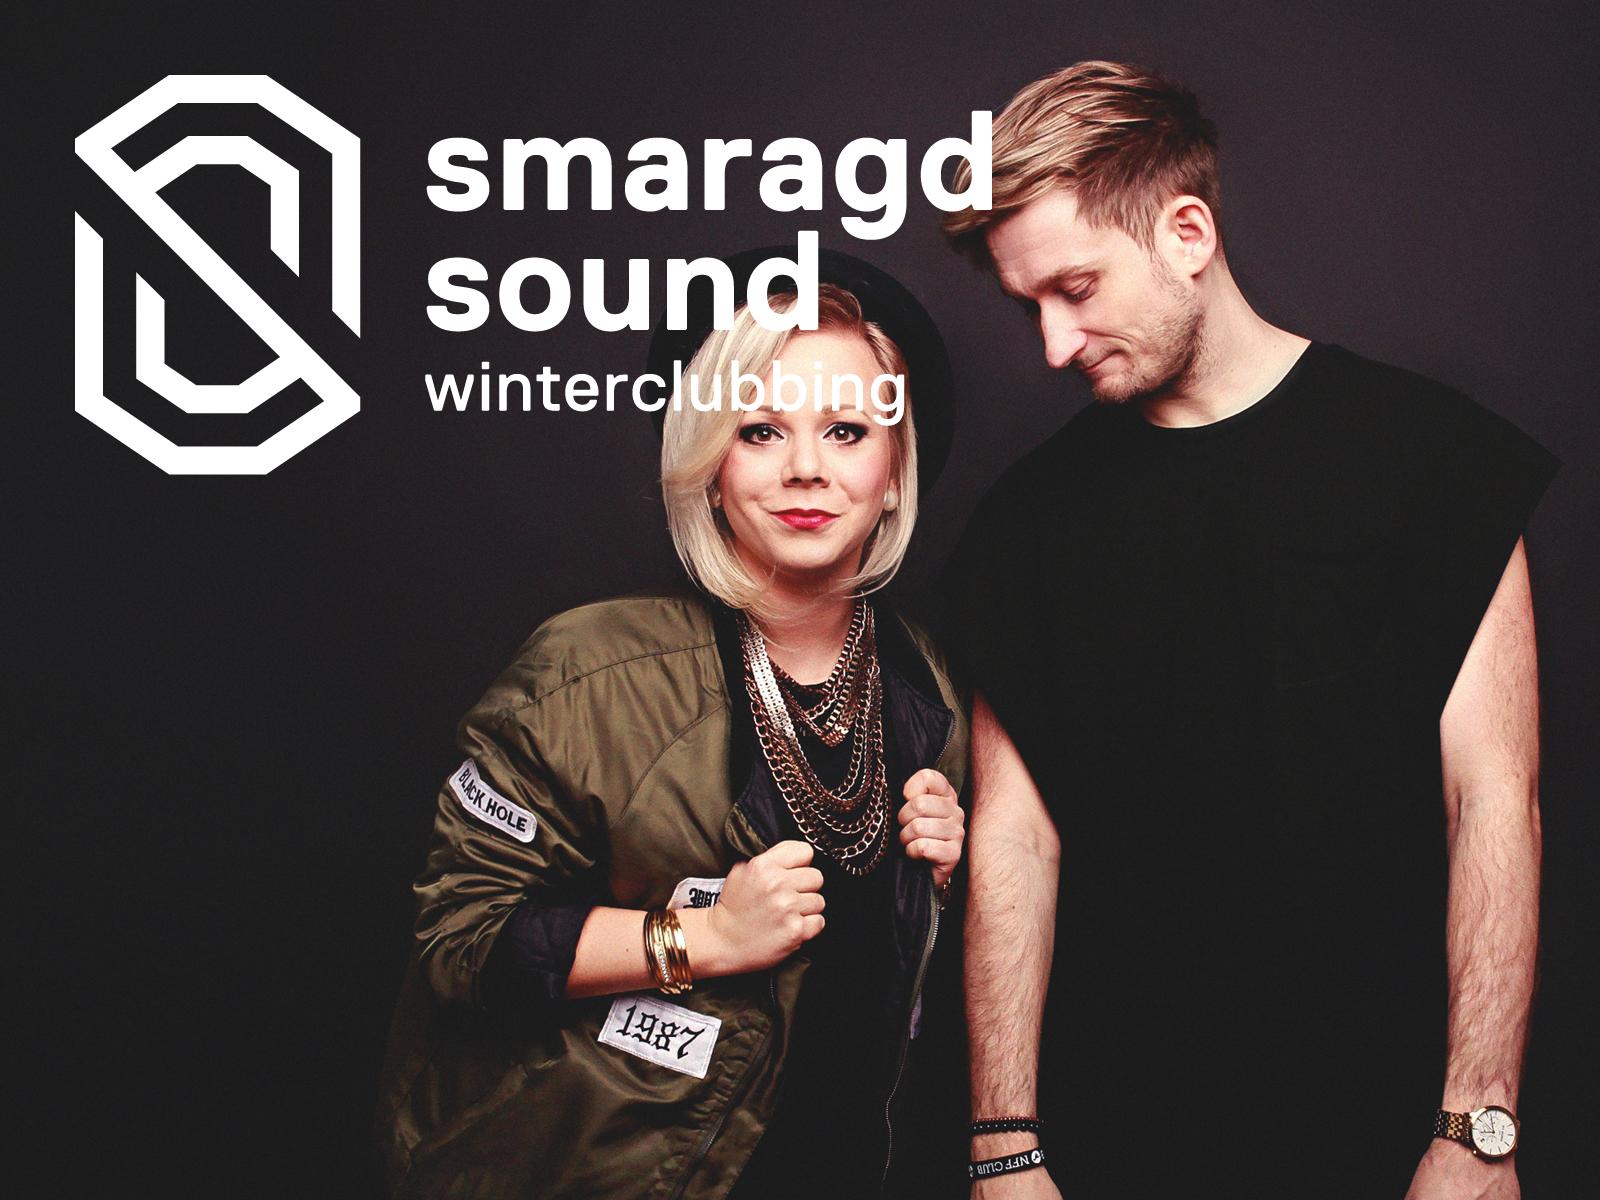 Smaragd Sound 2016